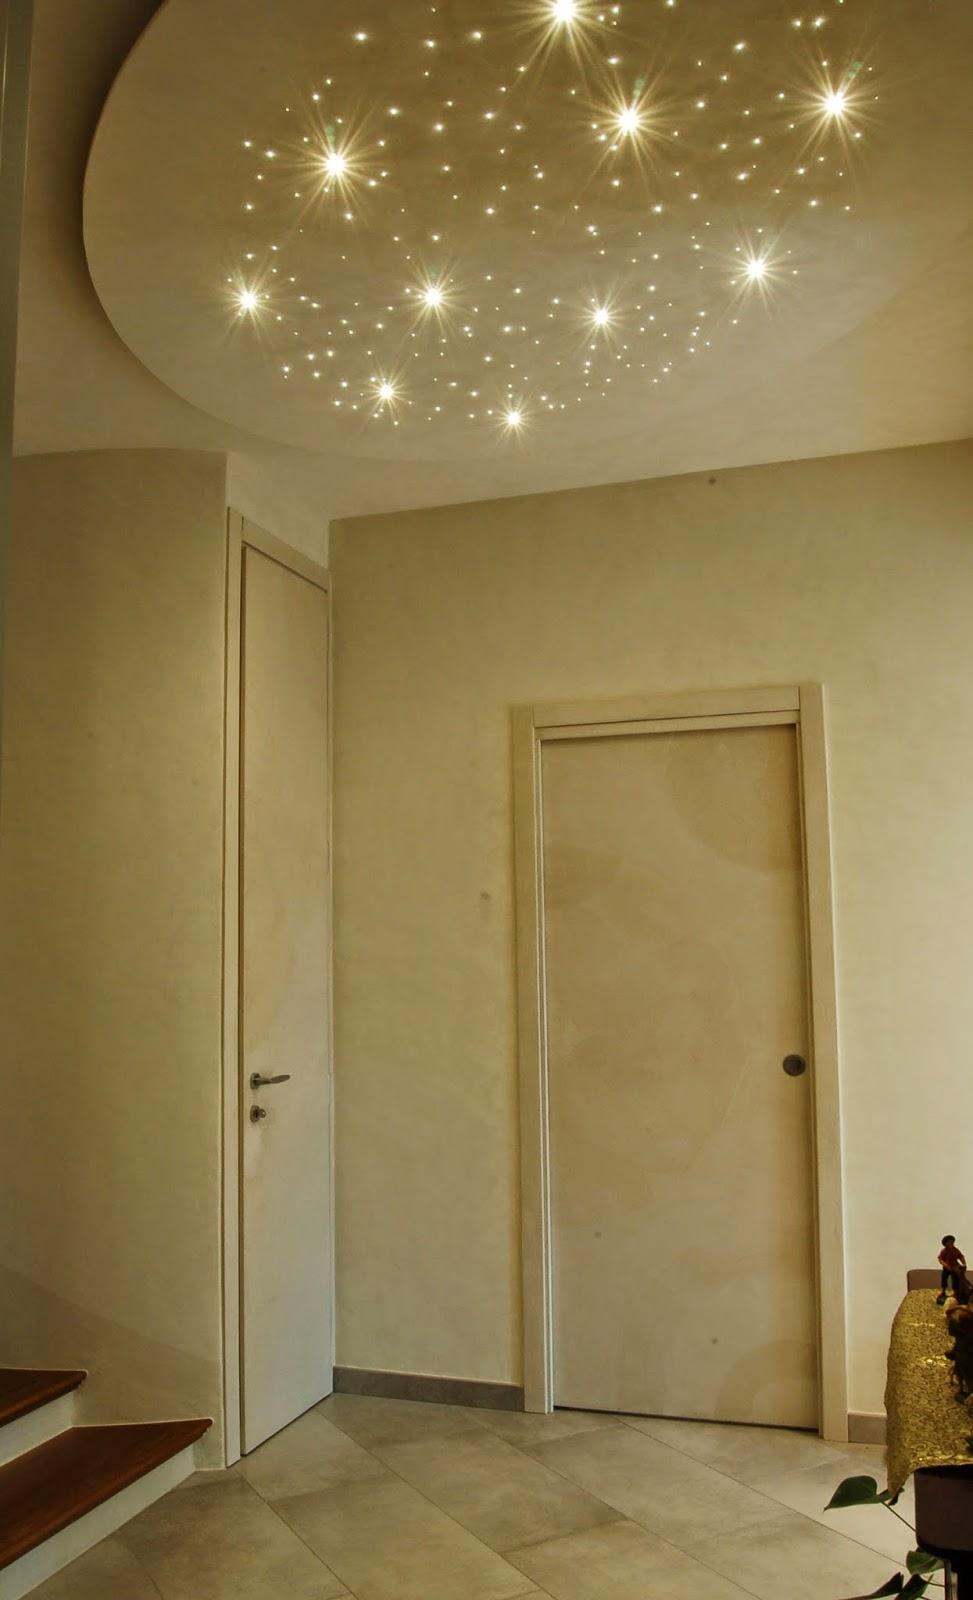 Illuminazione Led casa febbraio 2015